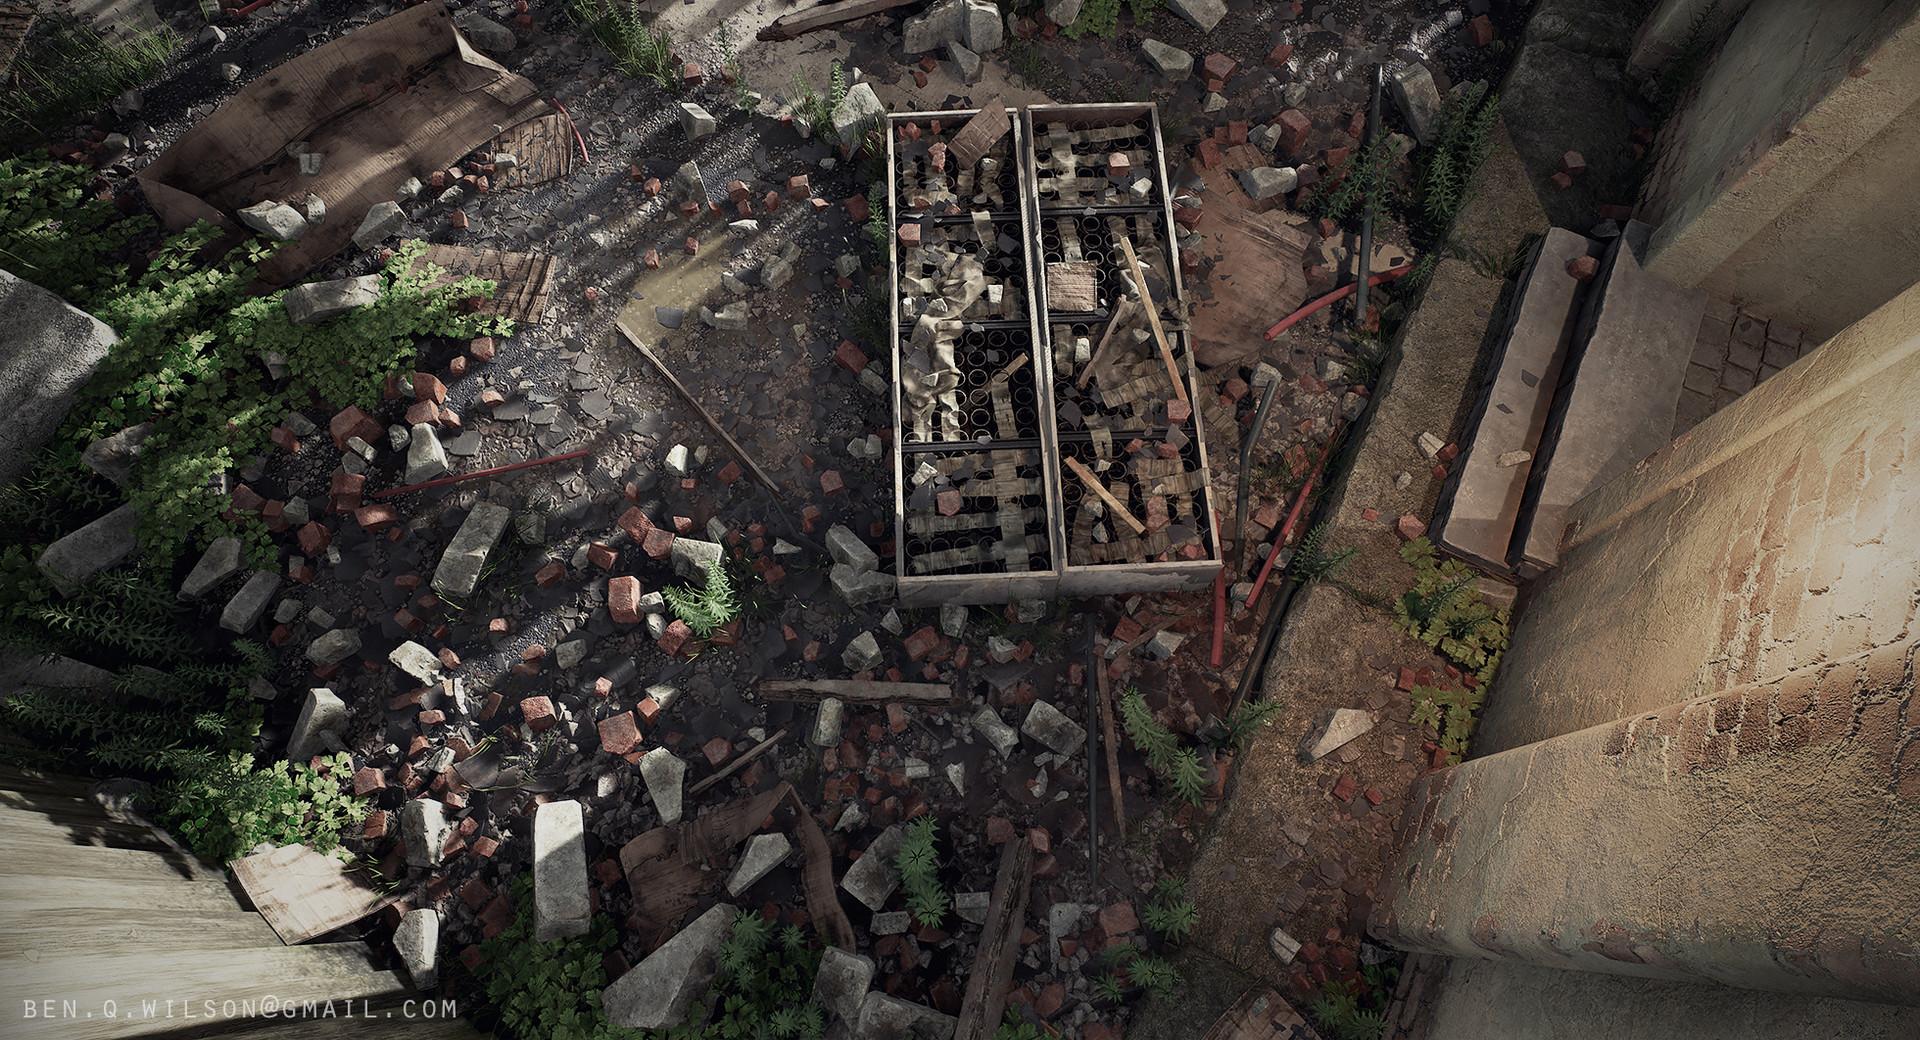 Ben wilson rubble corner screenshot a